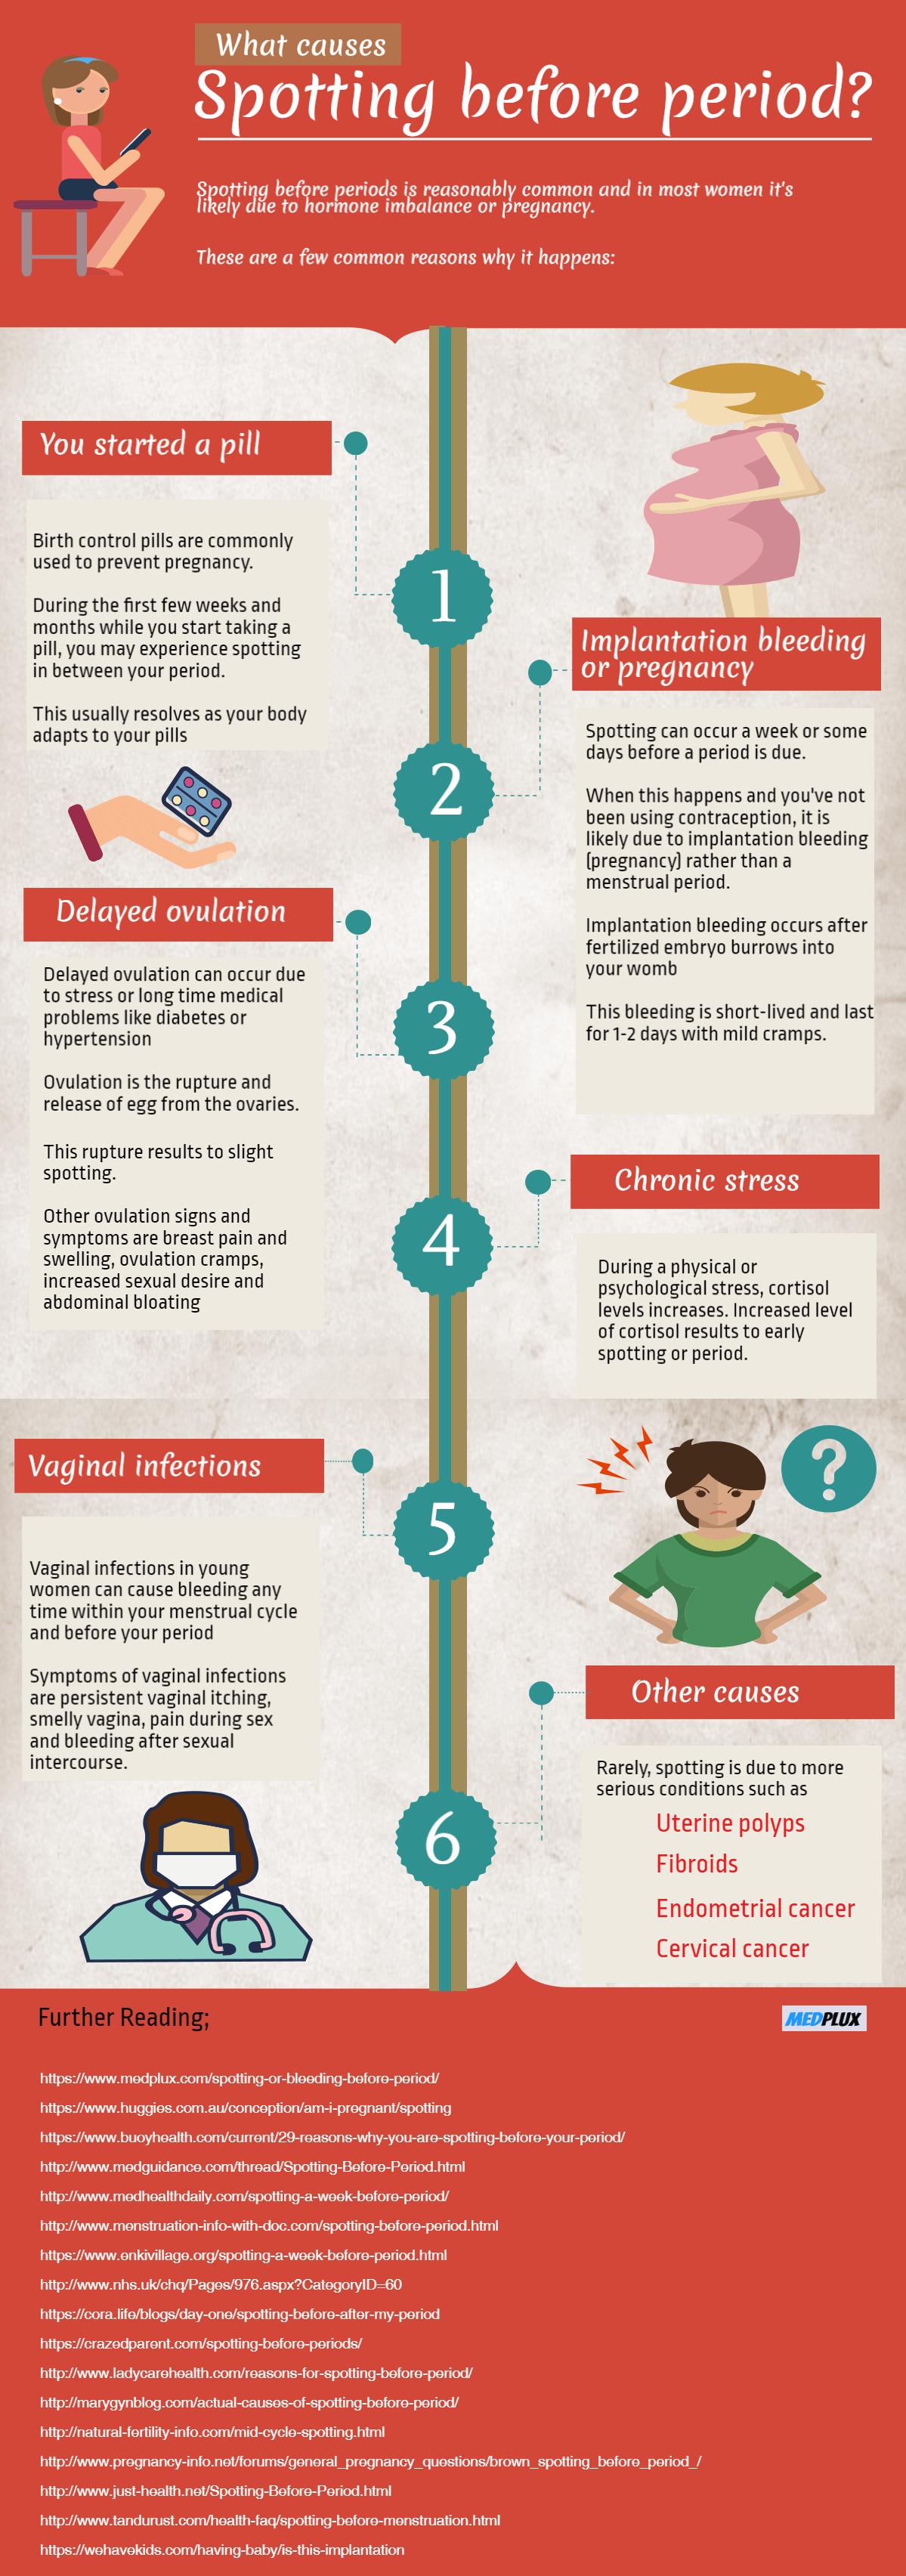 6 main reasons for bleeding before period